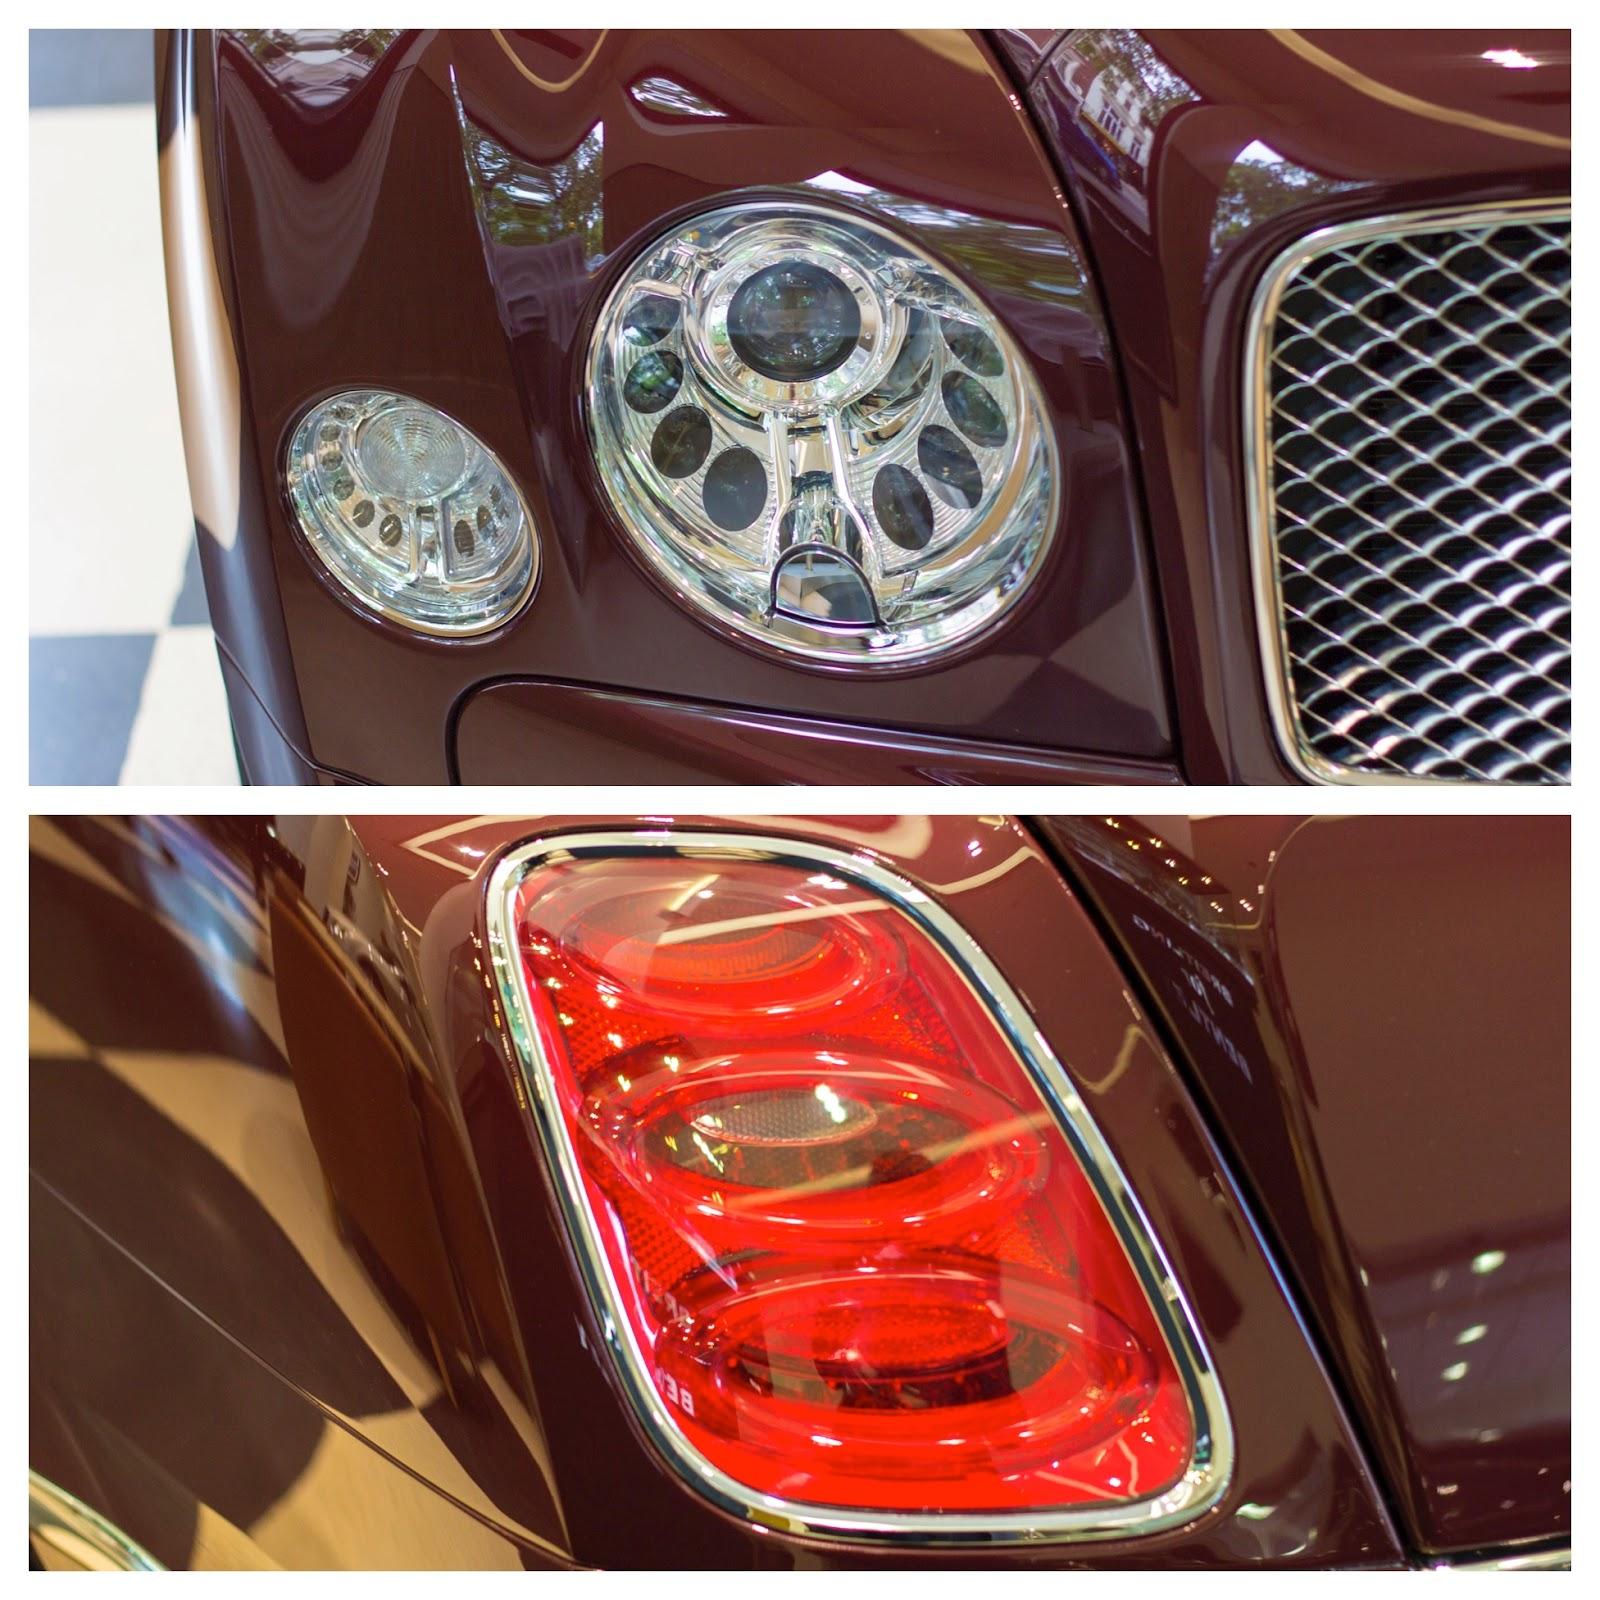 Bentley Mulsanne from Jack Barclay London